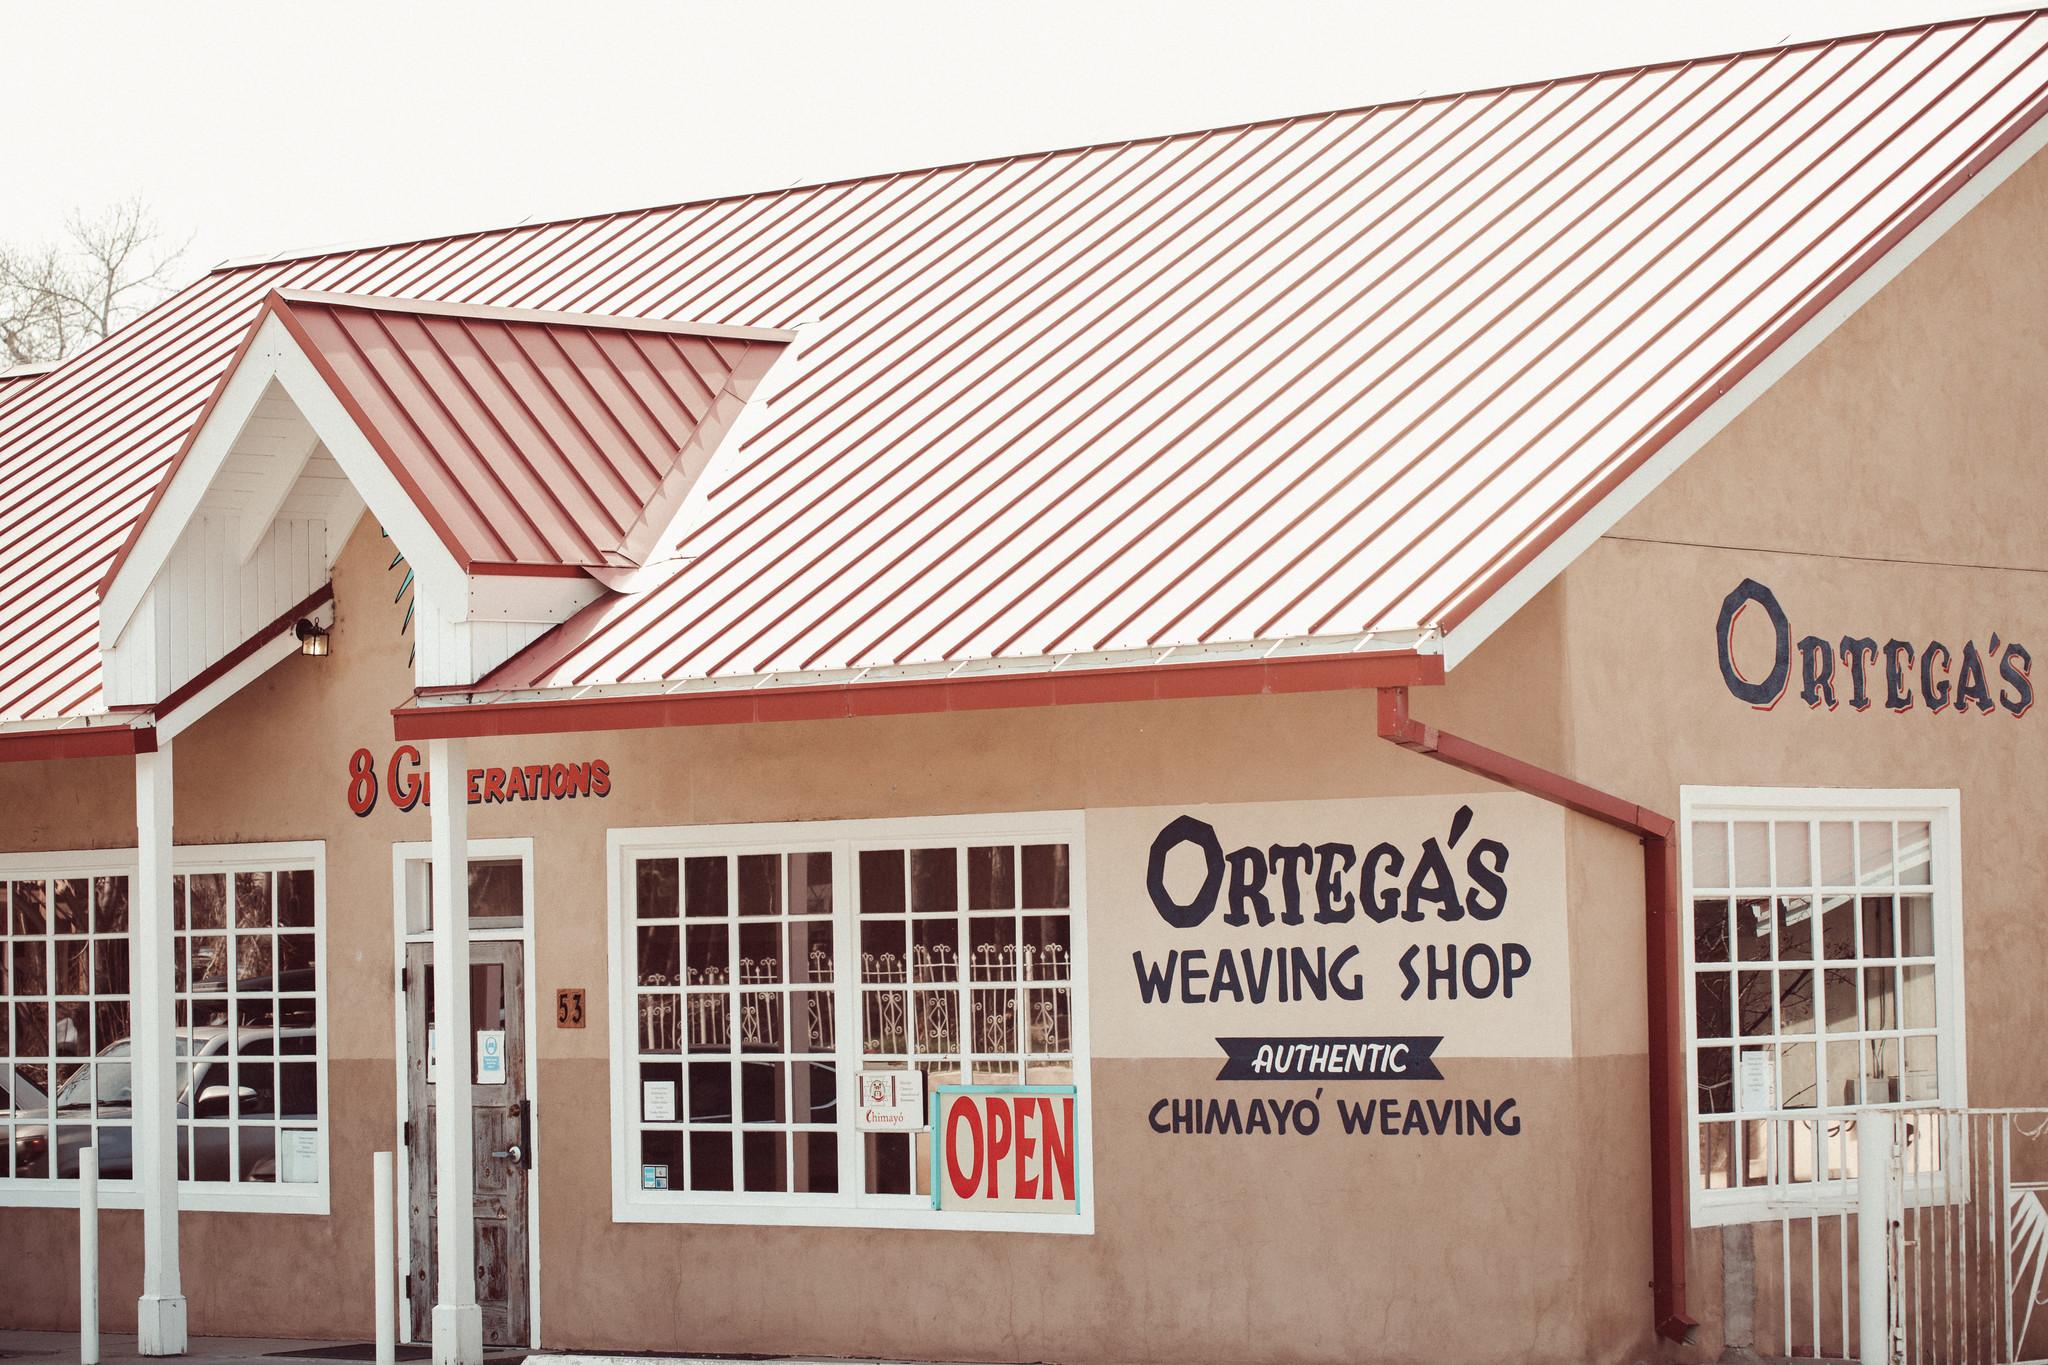 The Ortega's weaving shop